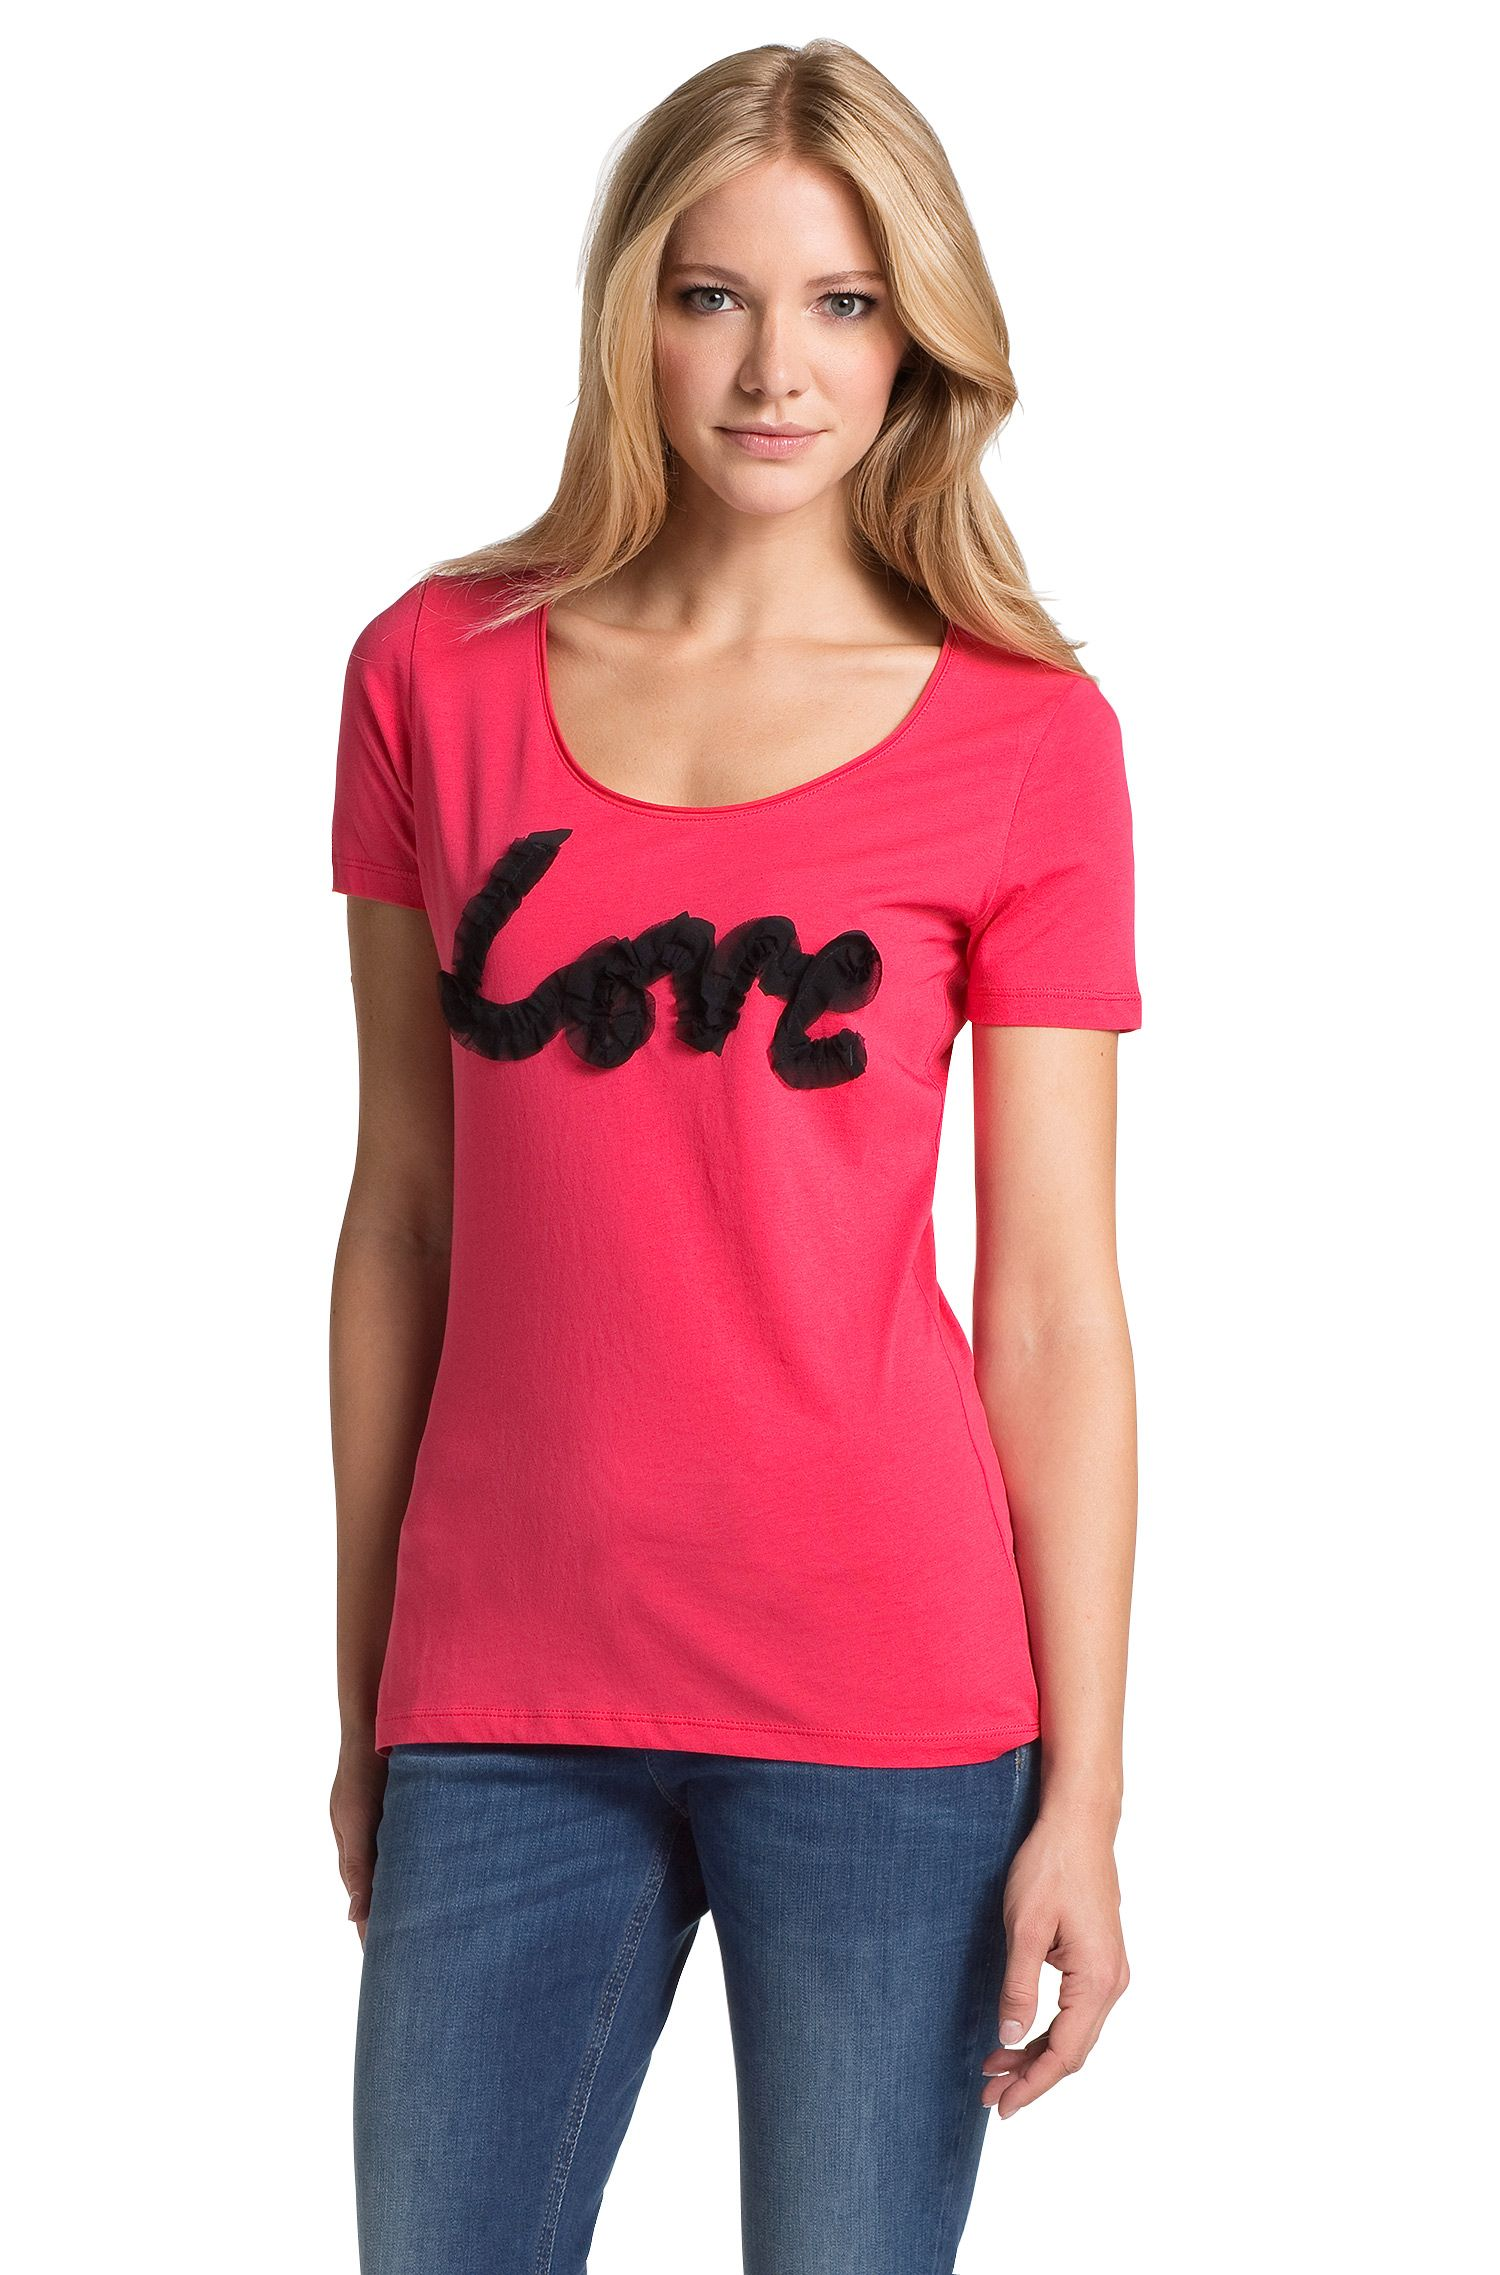 T-Shirt ´Tecca` aus Baumwolle